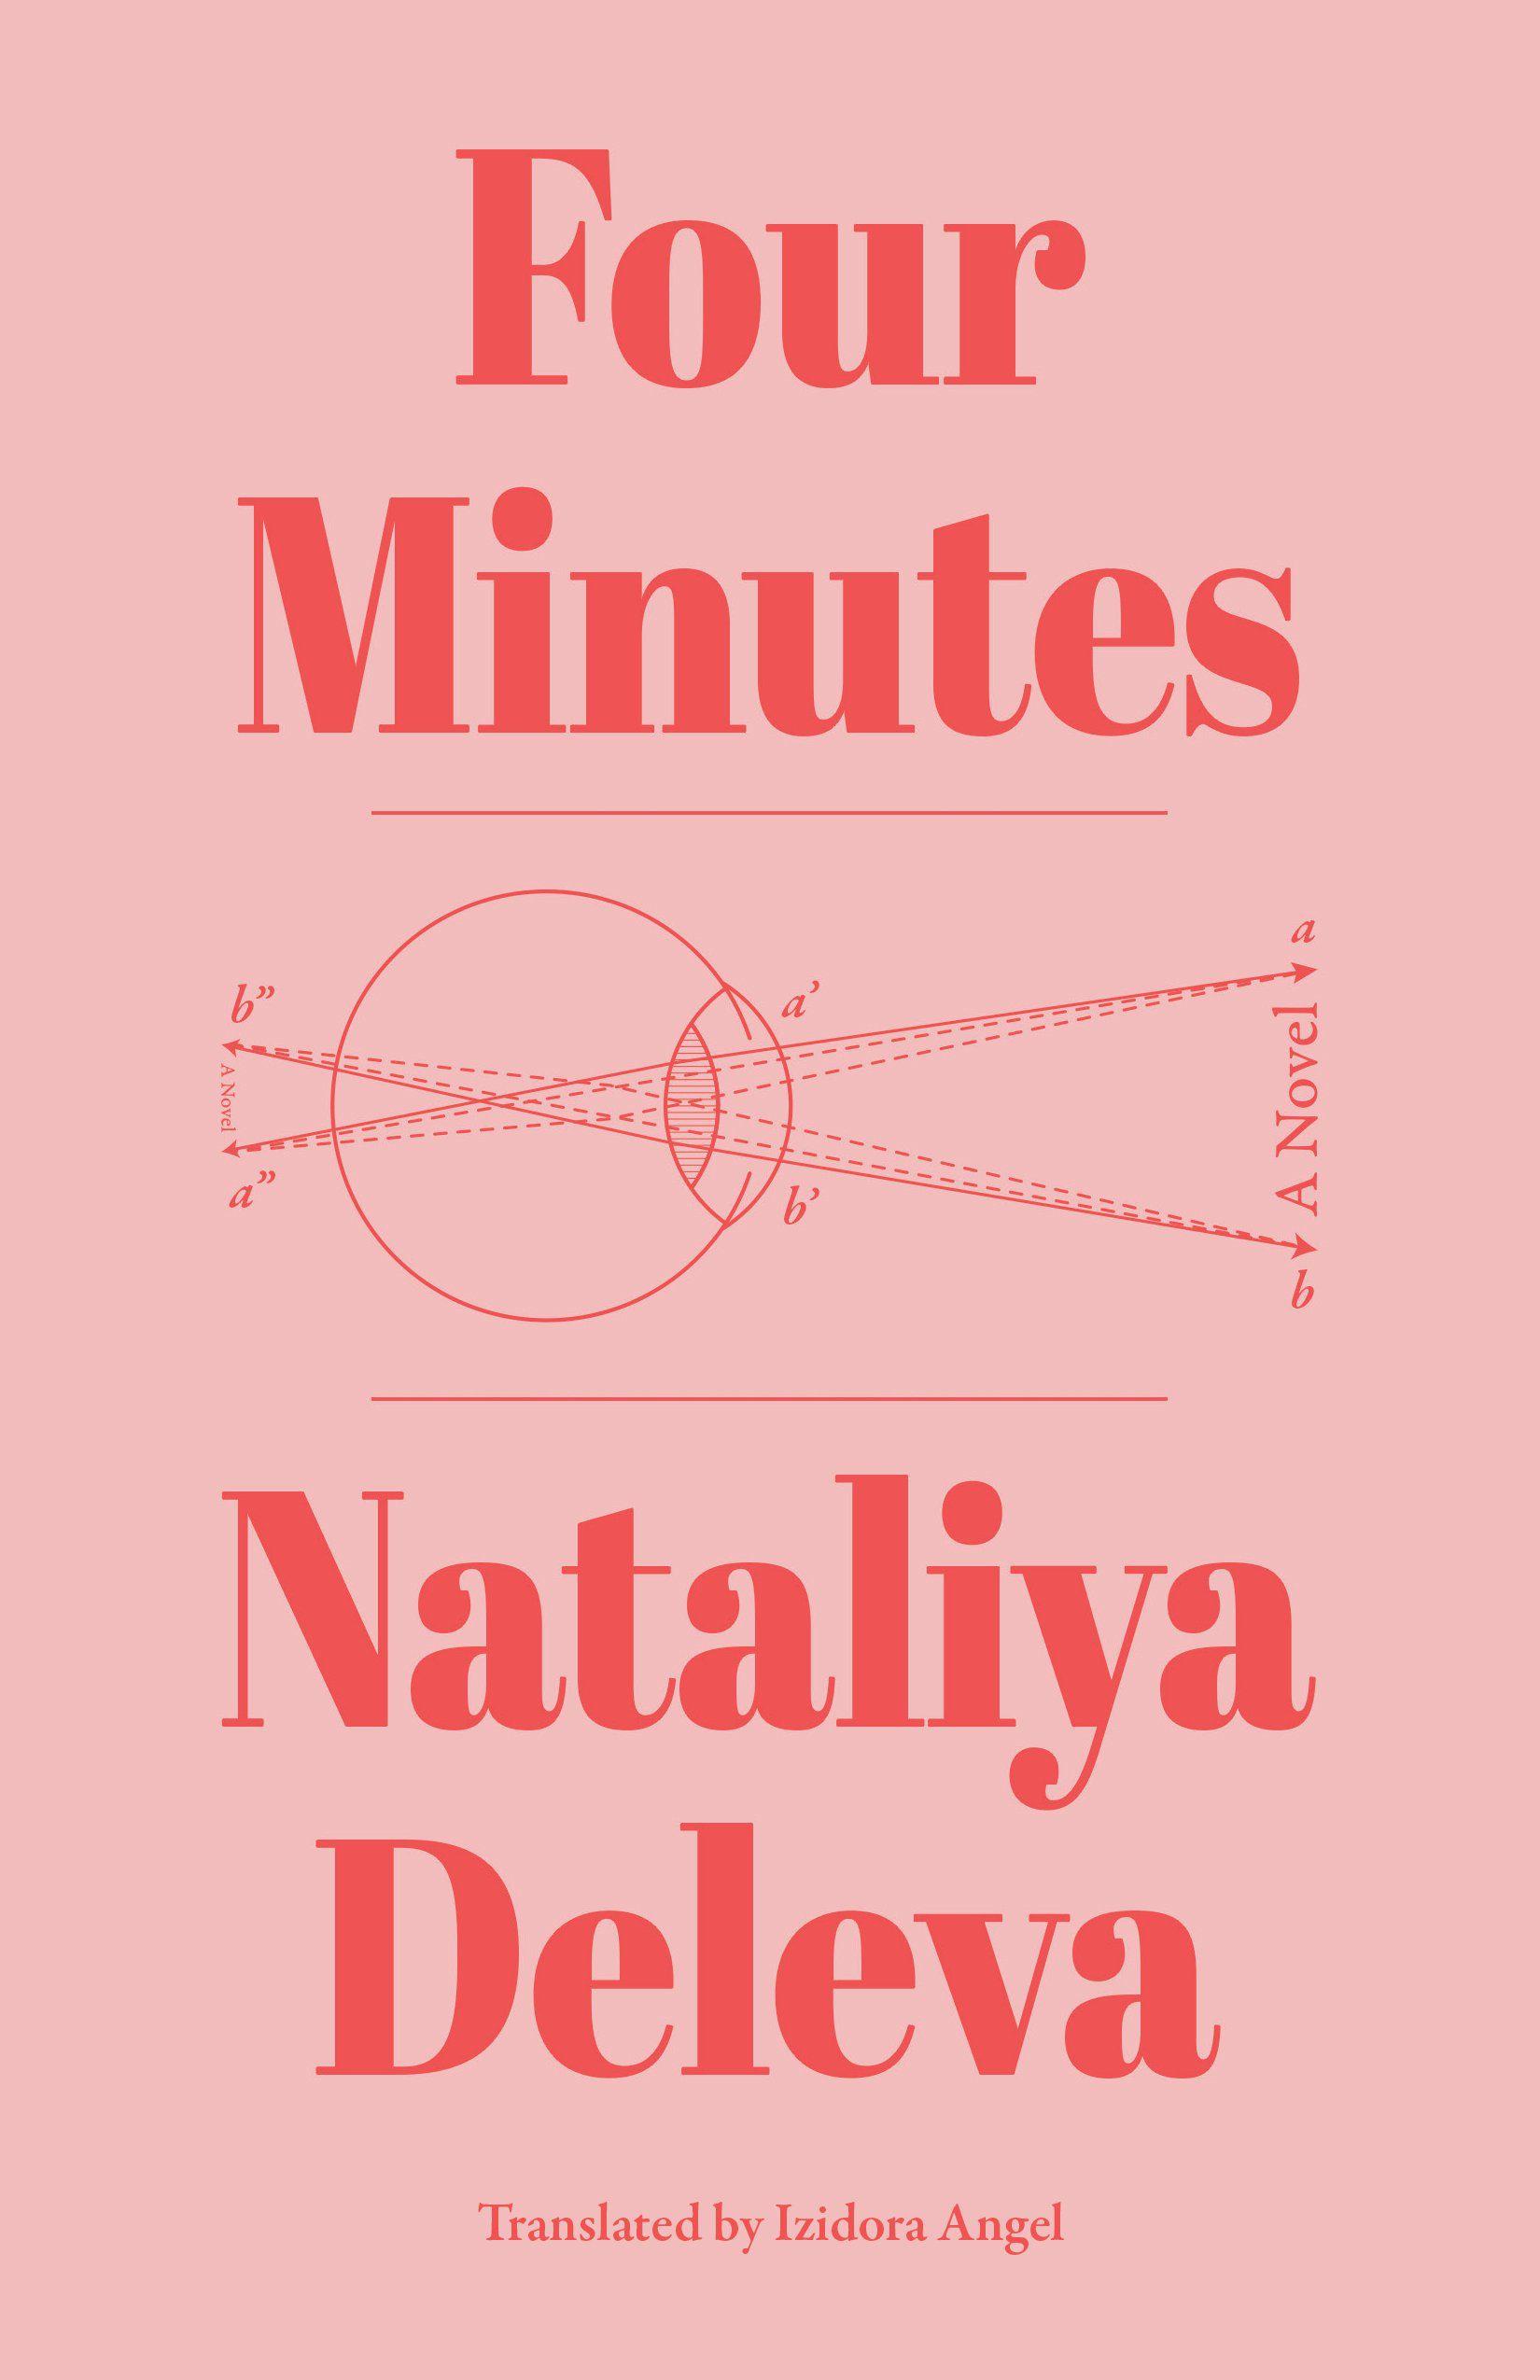 Four Minutes by Nataliya Deleva, translated by Izidora Angel